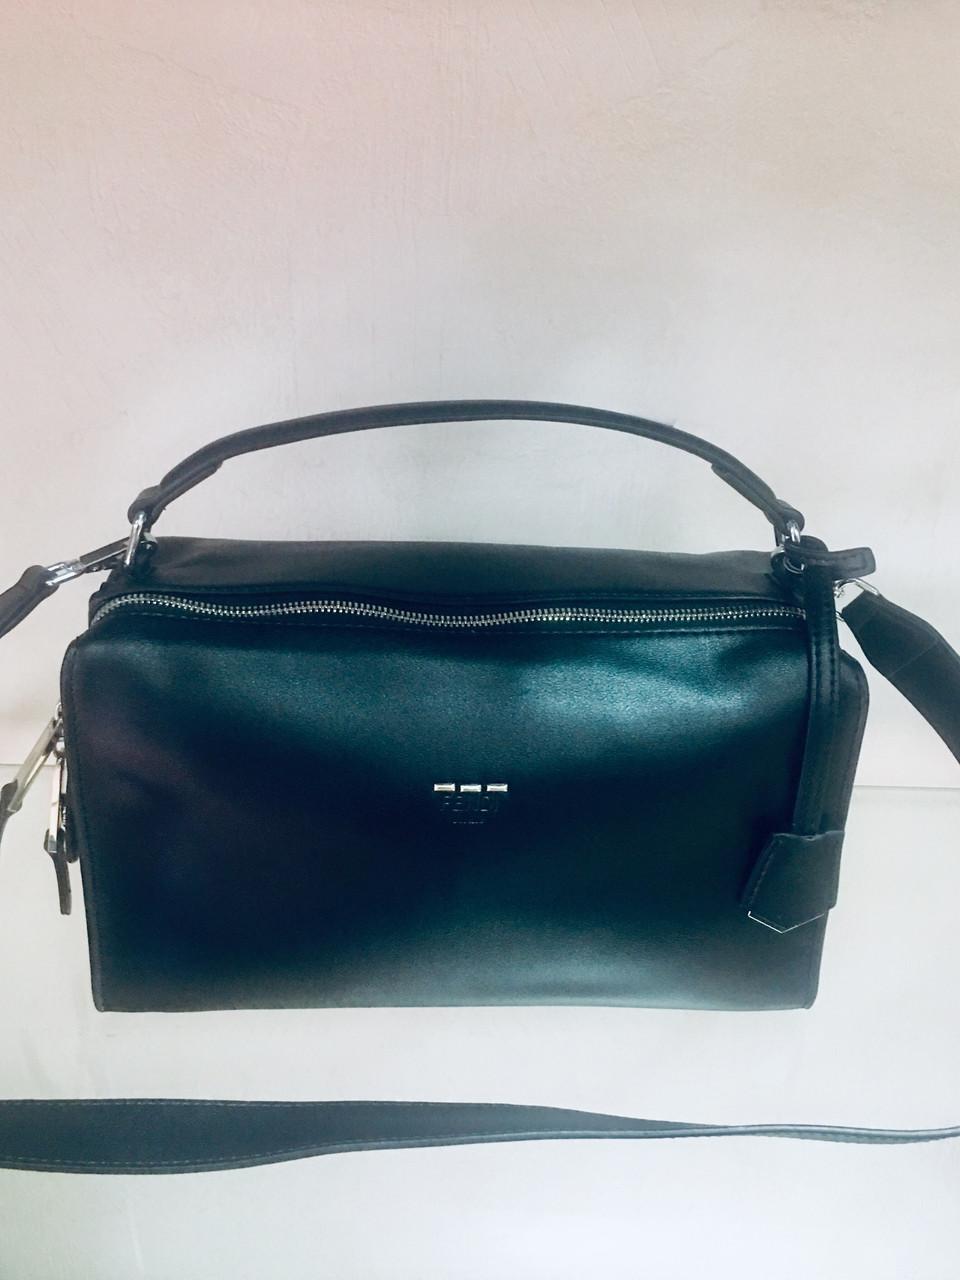 Сумка Fendi бренд LUX копия чёрная